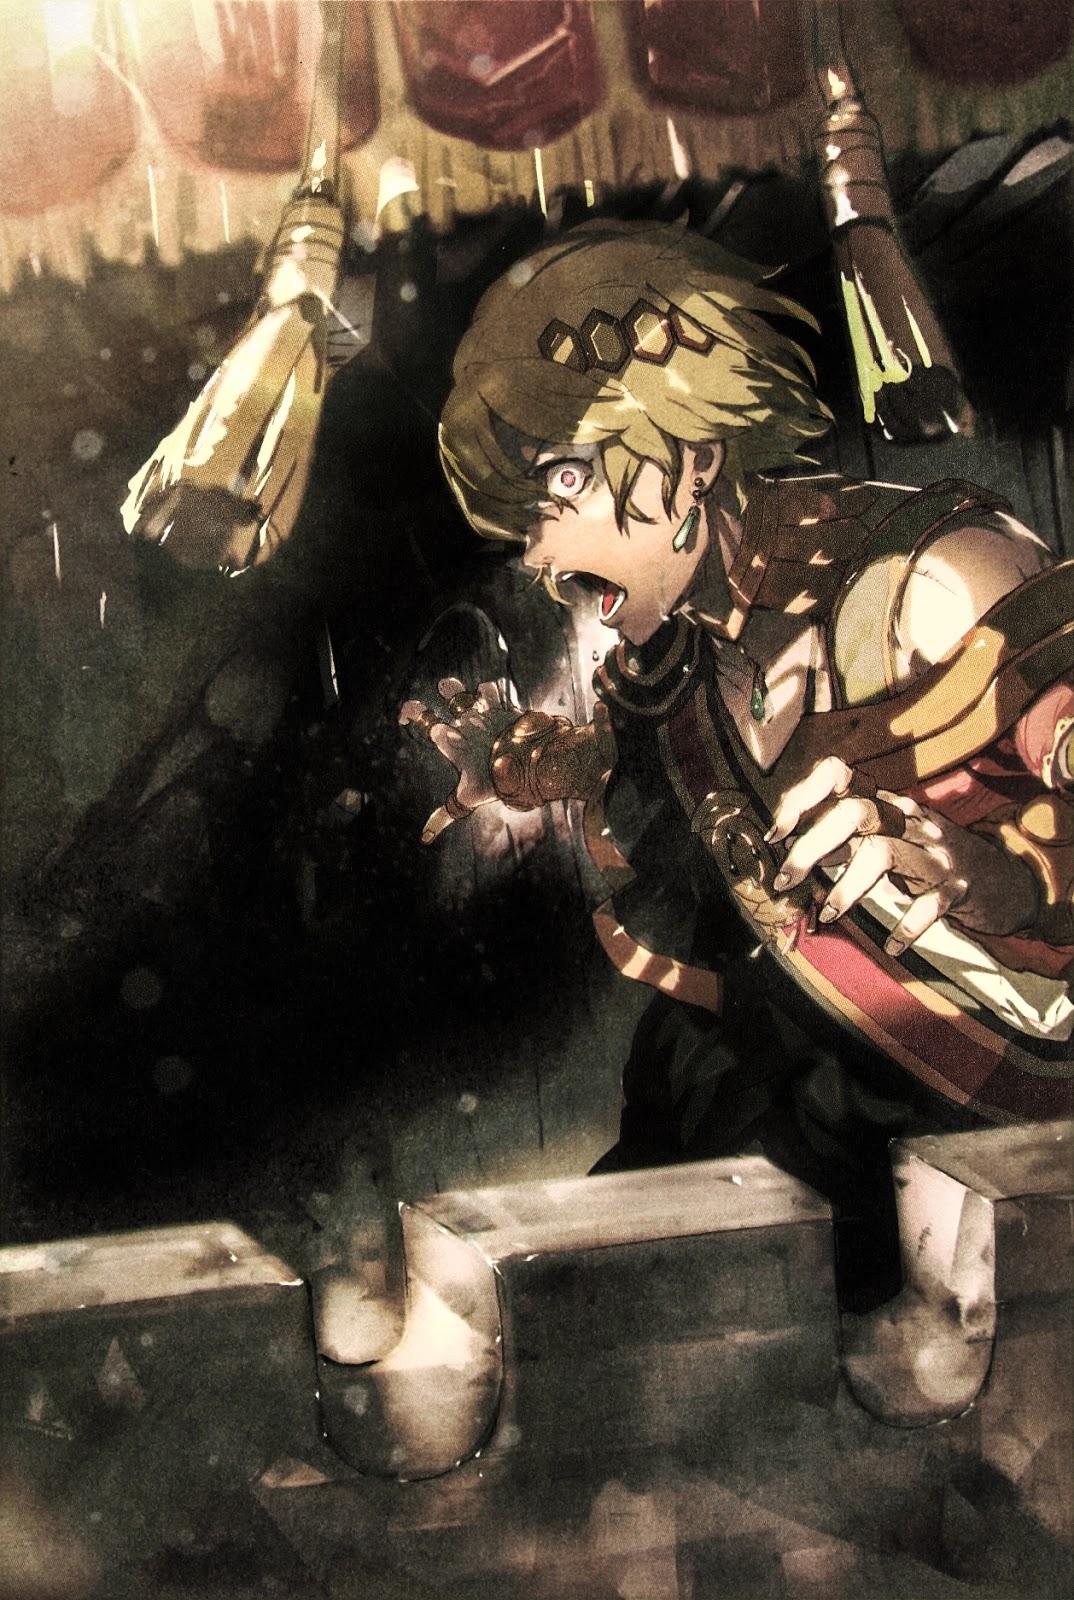 Overlord Novela Ligera: Overlord v10 c3